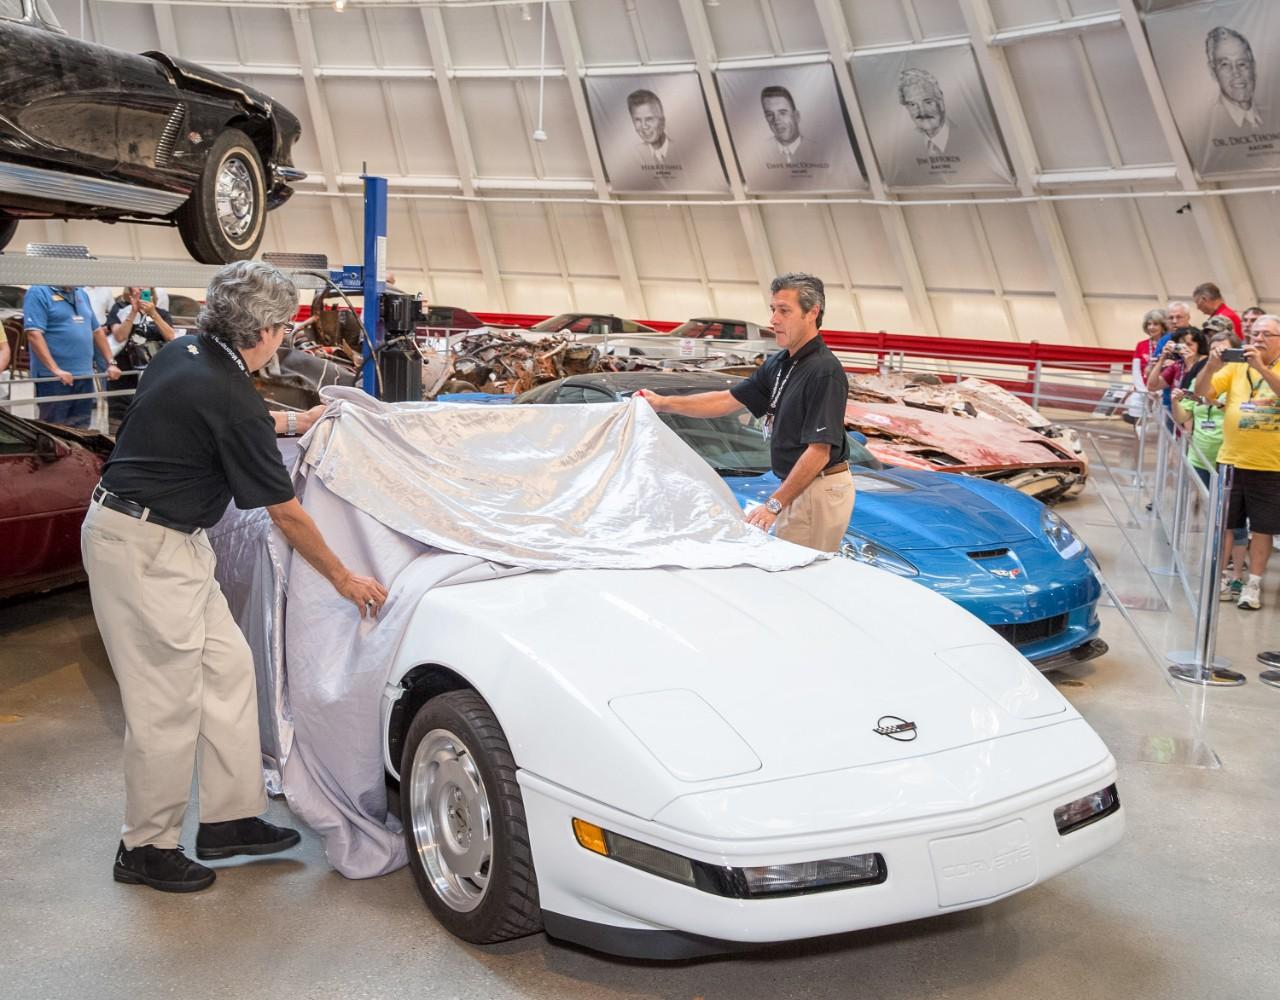 Corvette 1,000,000 restored to new